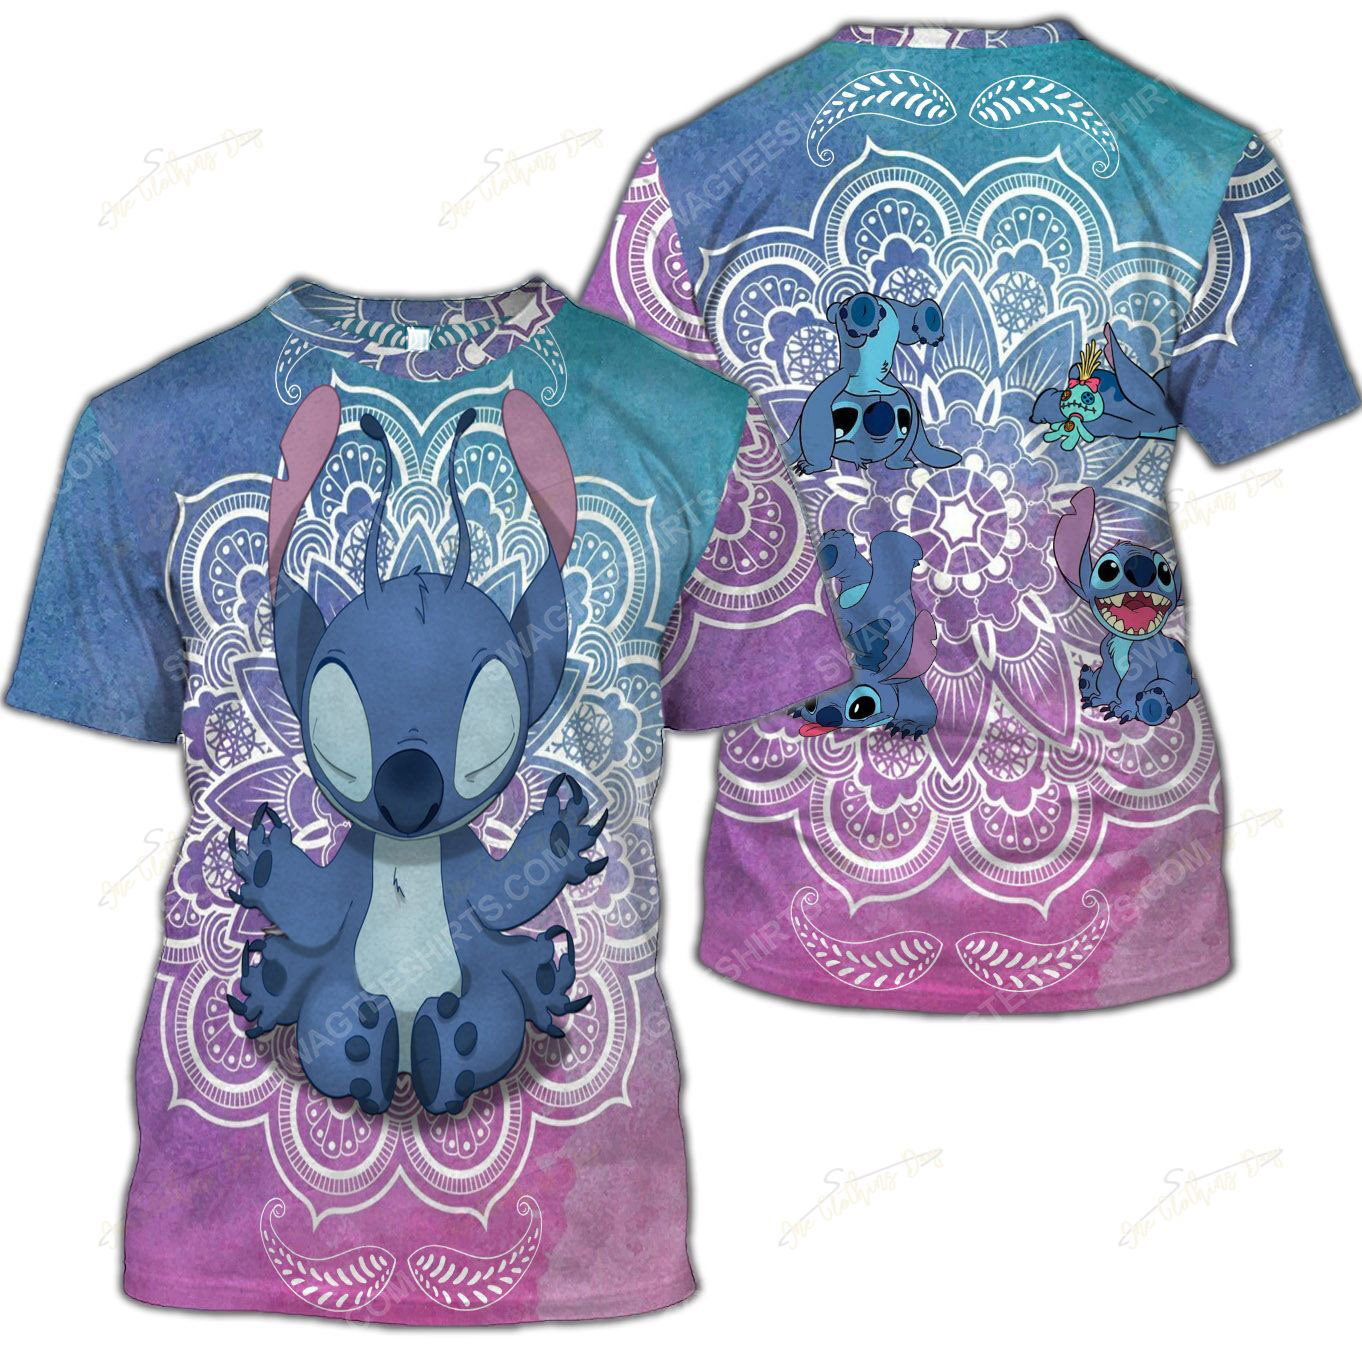 The stitch namaste full printed shirt 5(1)